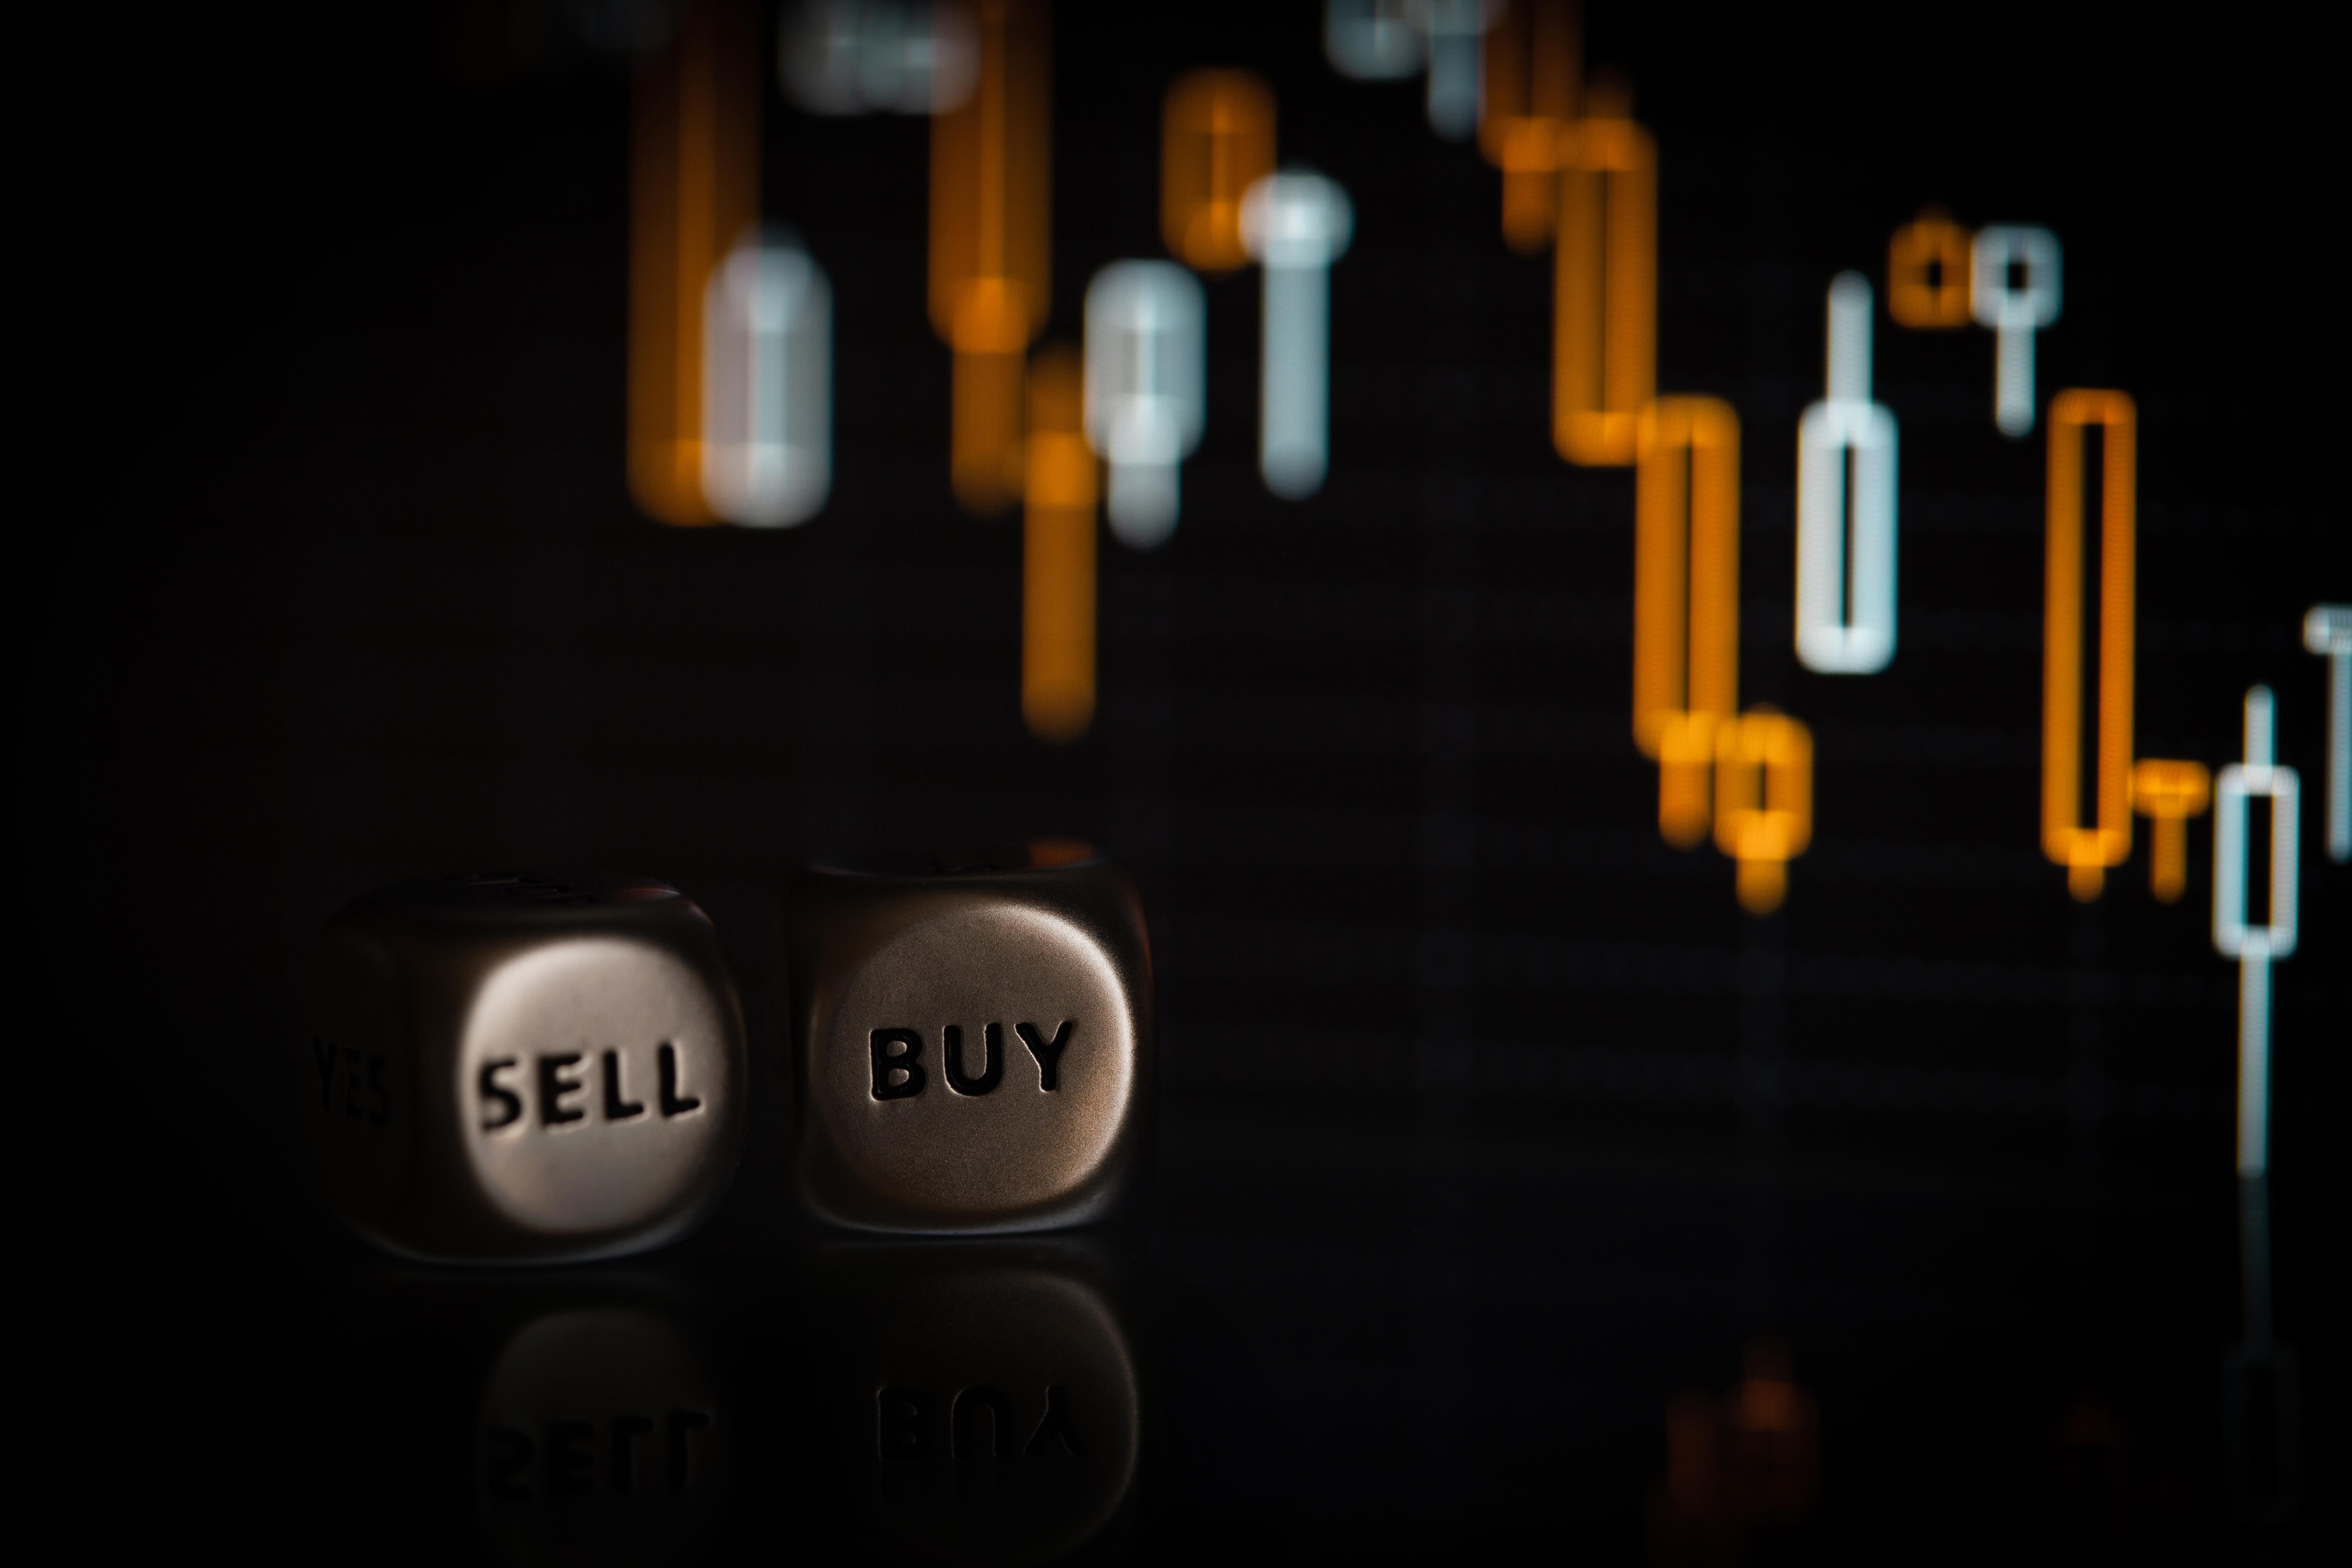 Stocks Have Gone Streaking! Thumbnail